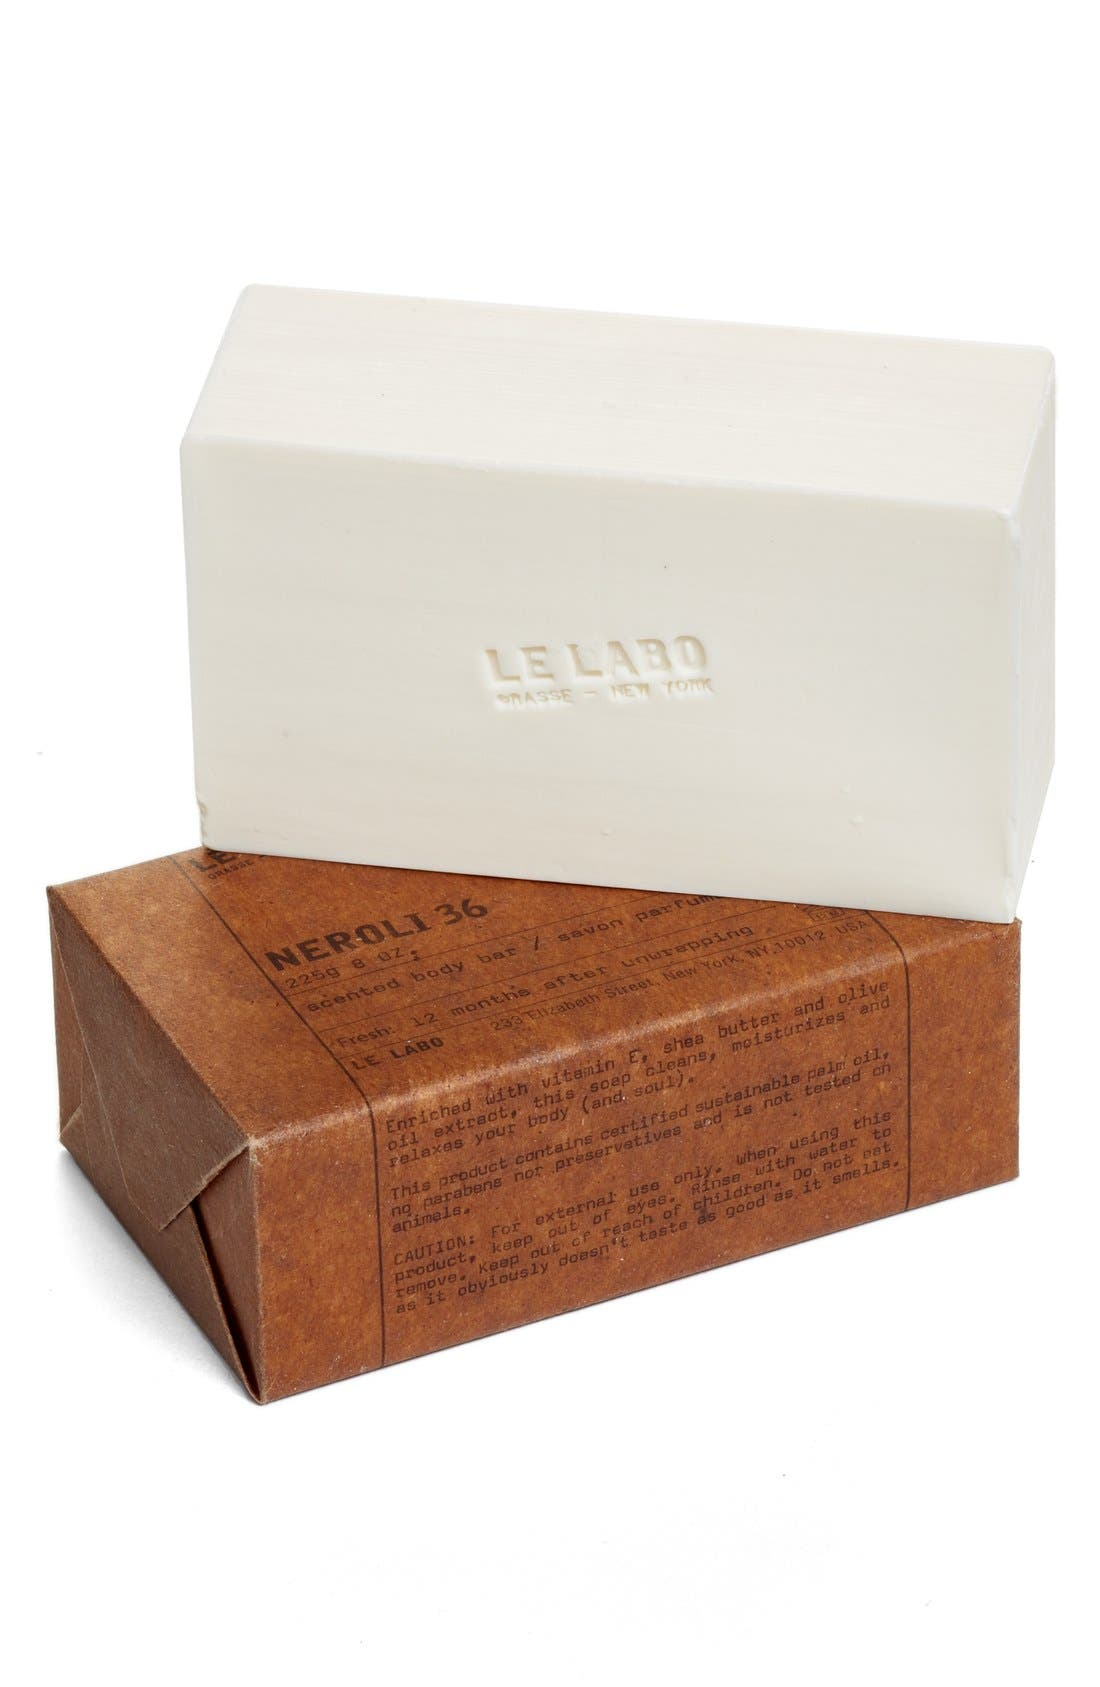 Le Labo 'Neroli 36' Bar Soap